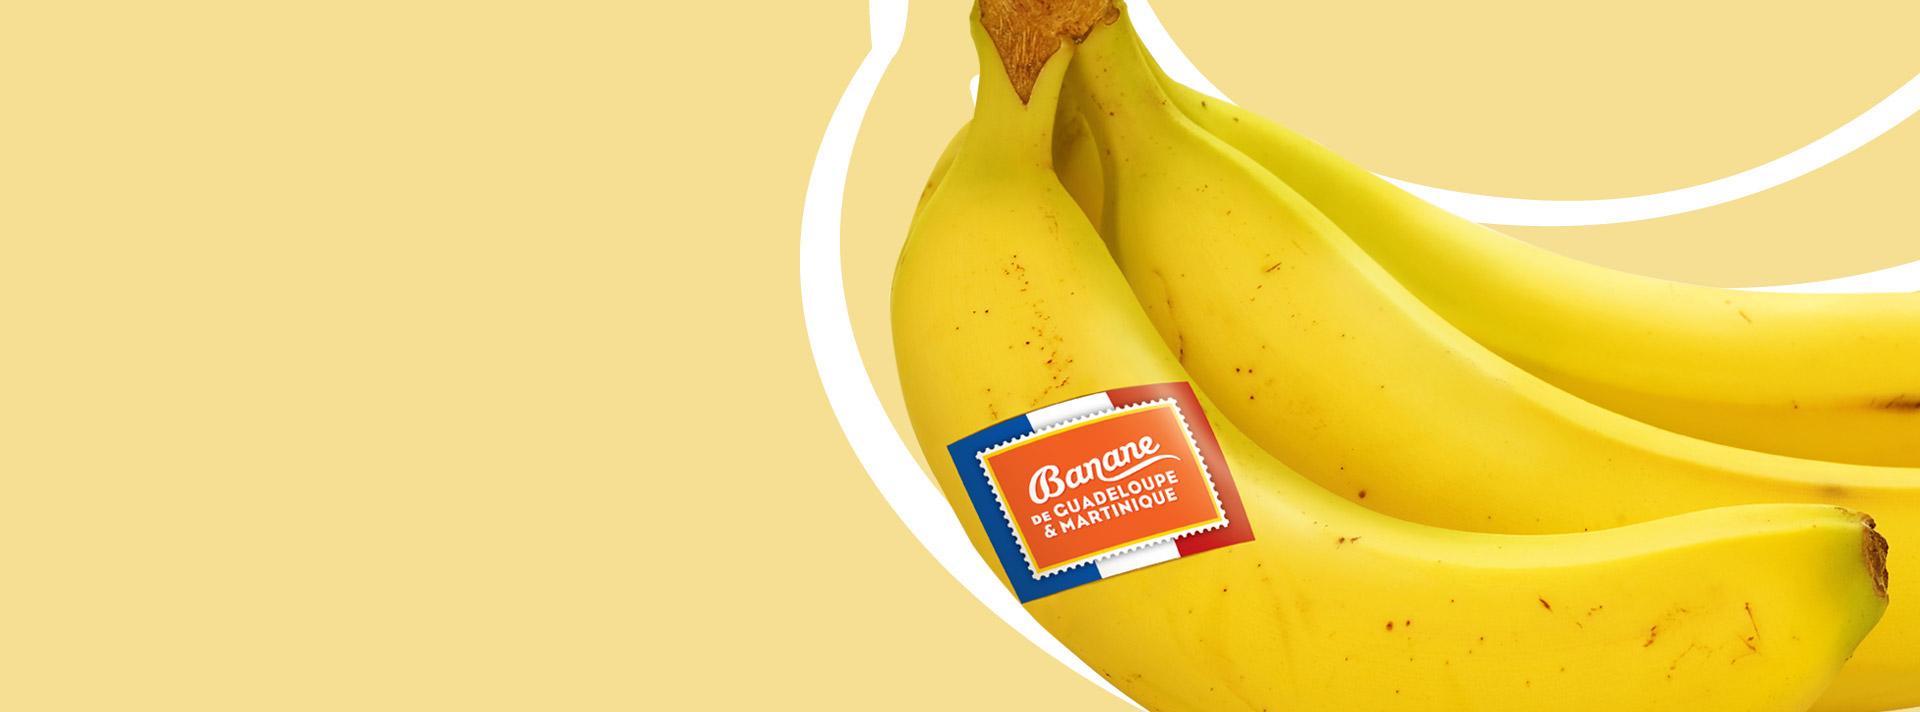 slide-banane-planteur-2-1